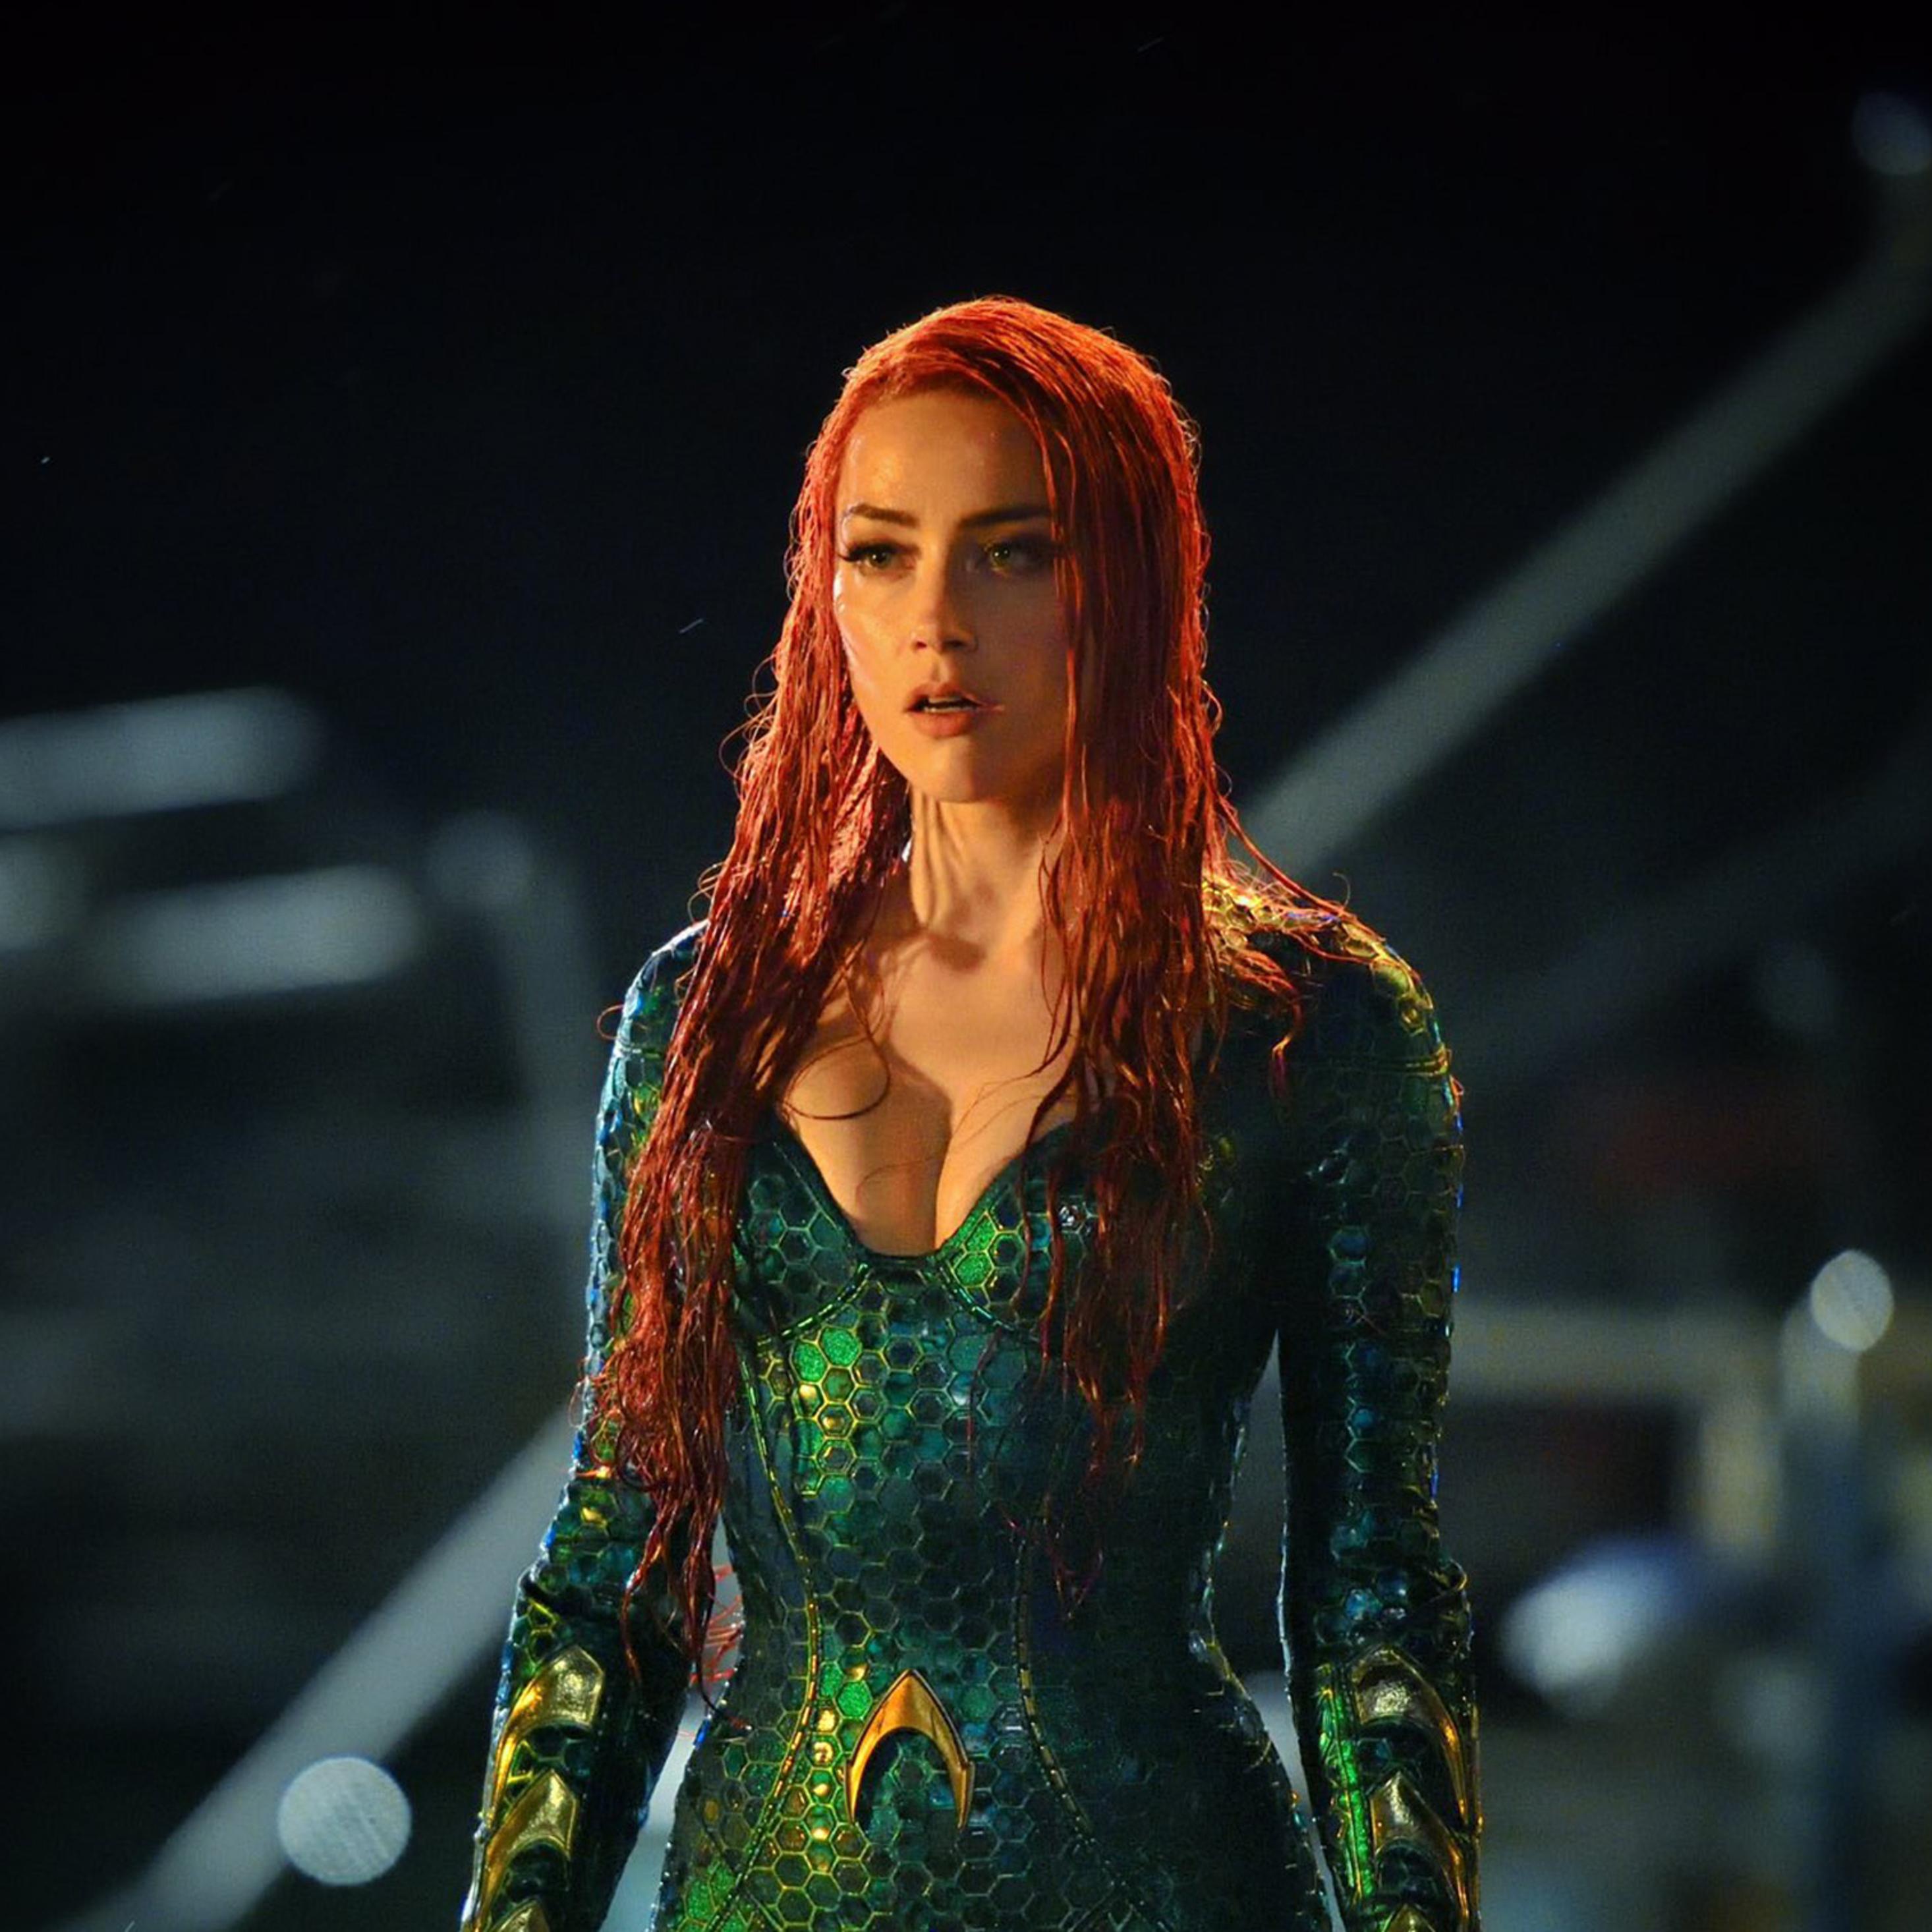 2932x2932 Amber Heard As Mera In Aquaman Ipad Pro Retina